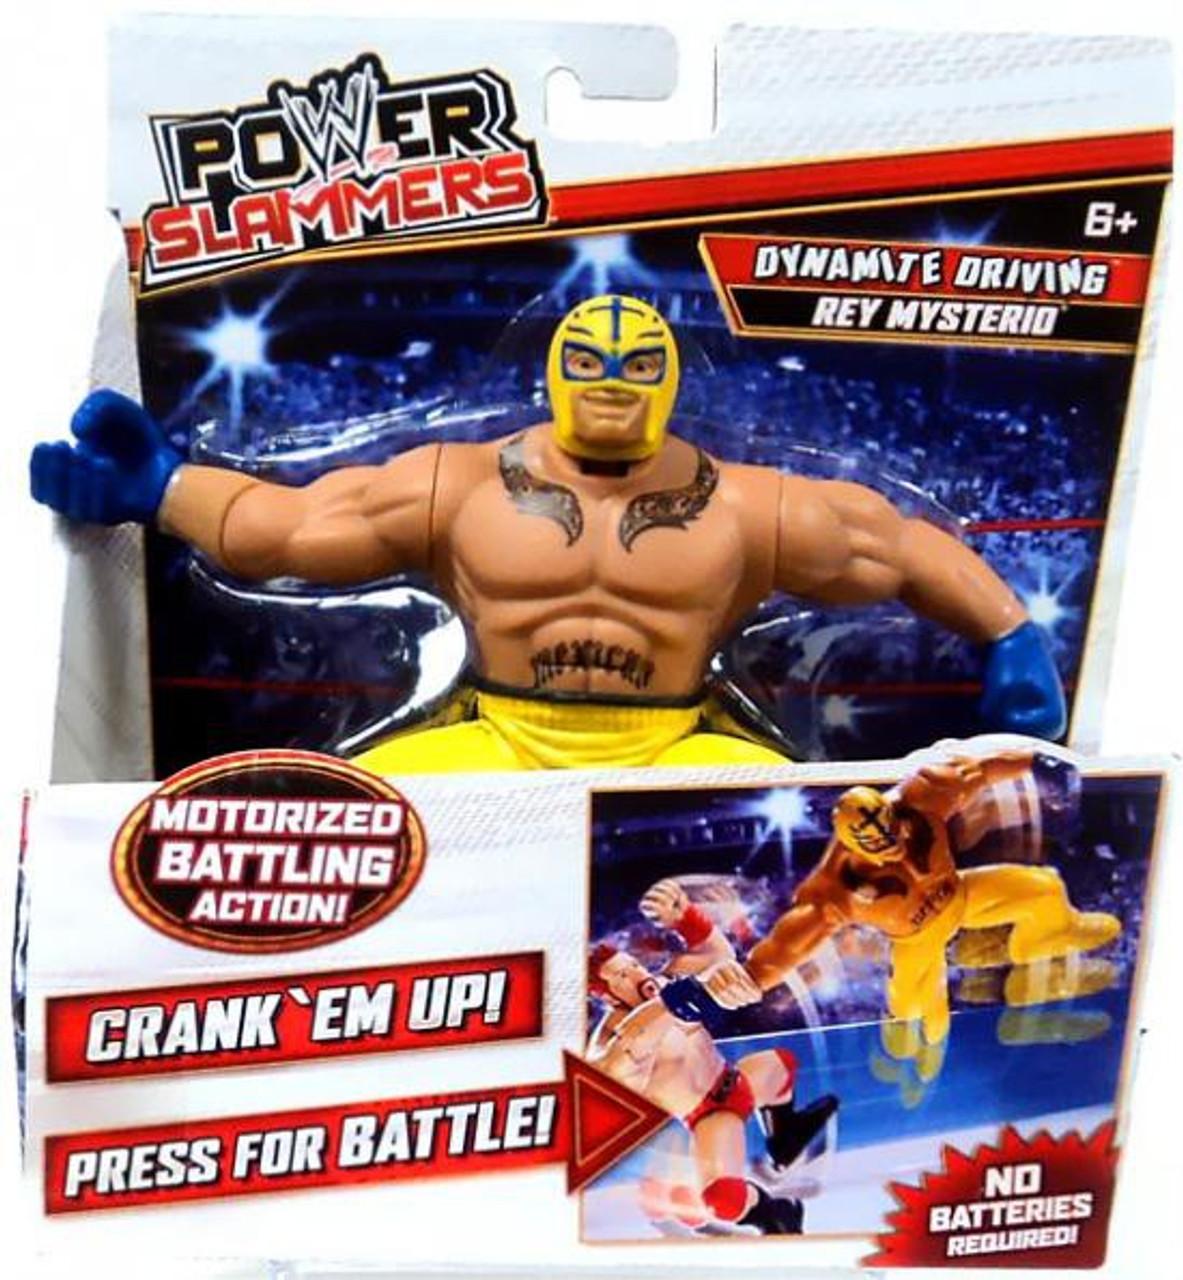 WWE Wrestling Power Slammers Dynamite Driving Rey Mysterio Action Figure